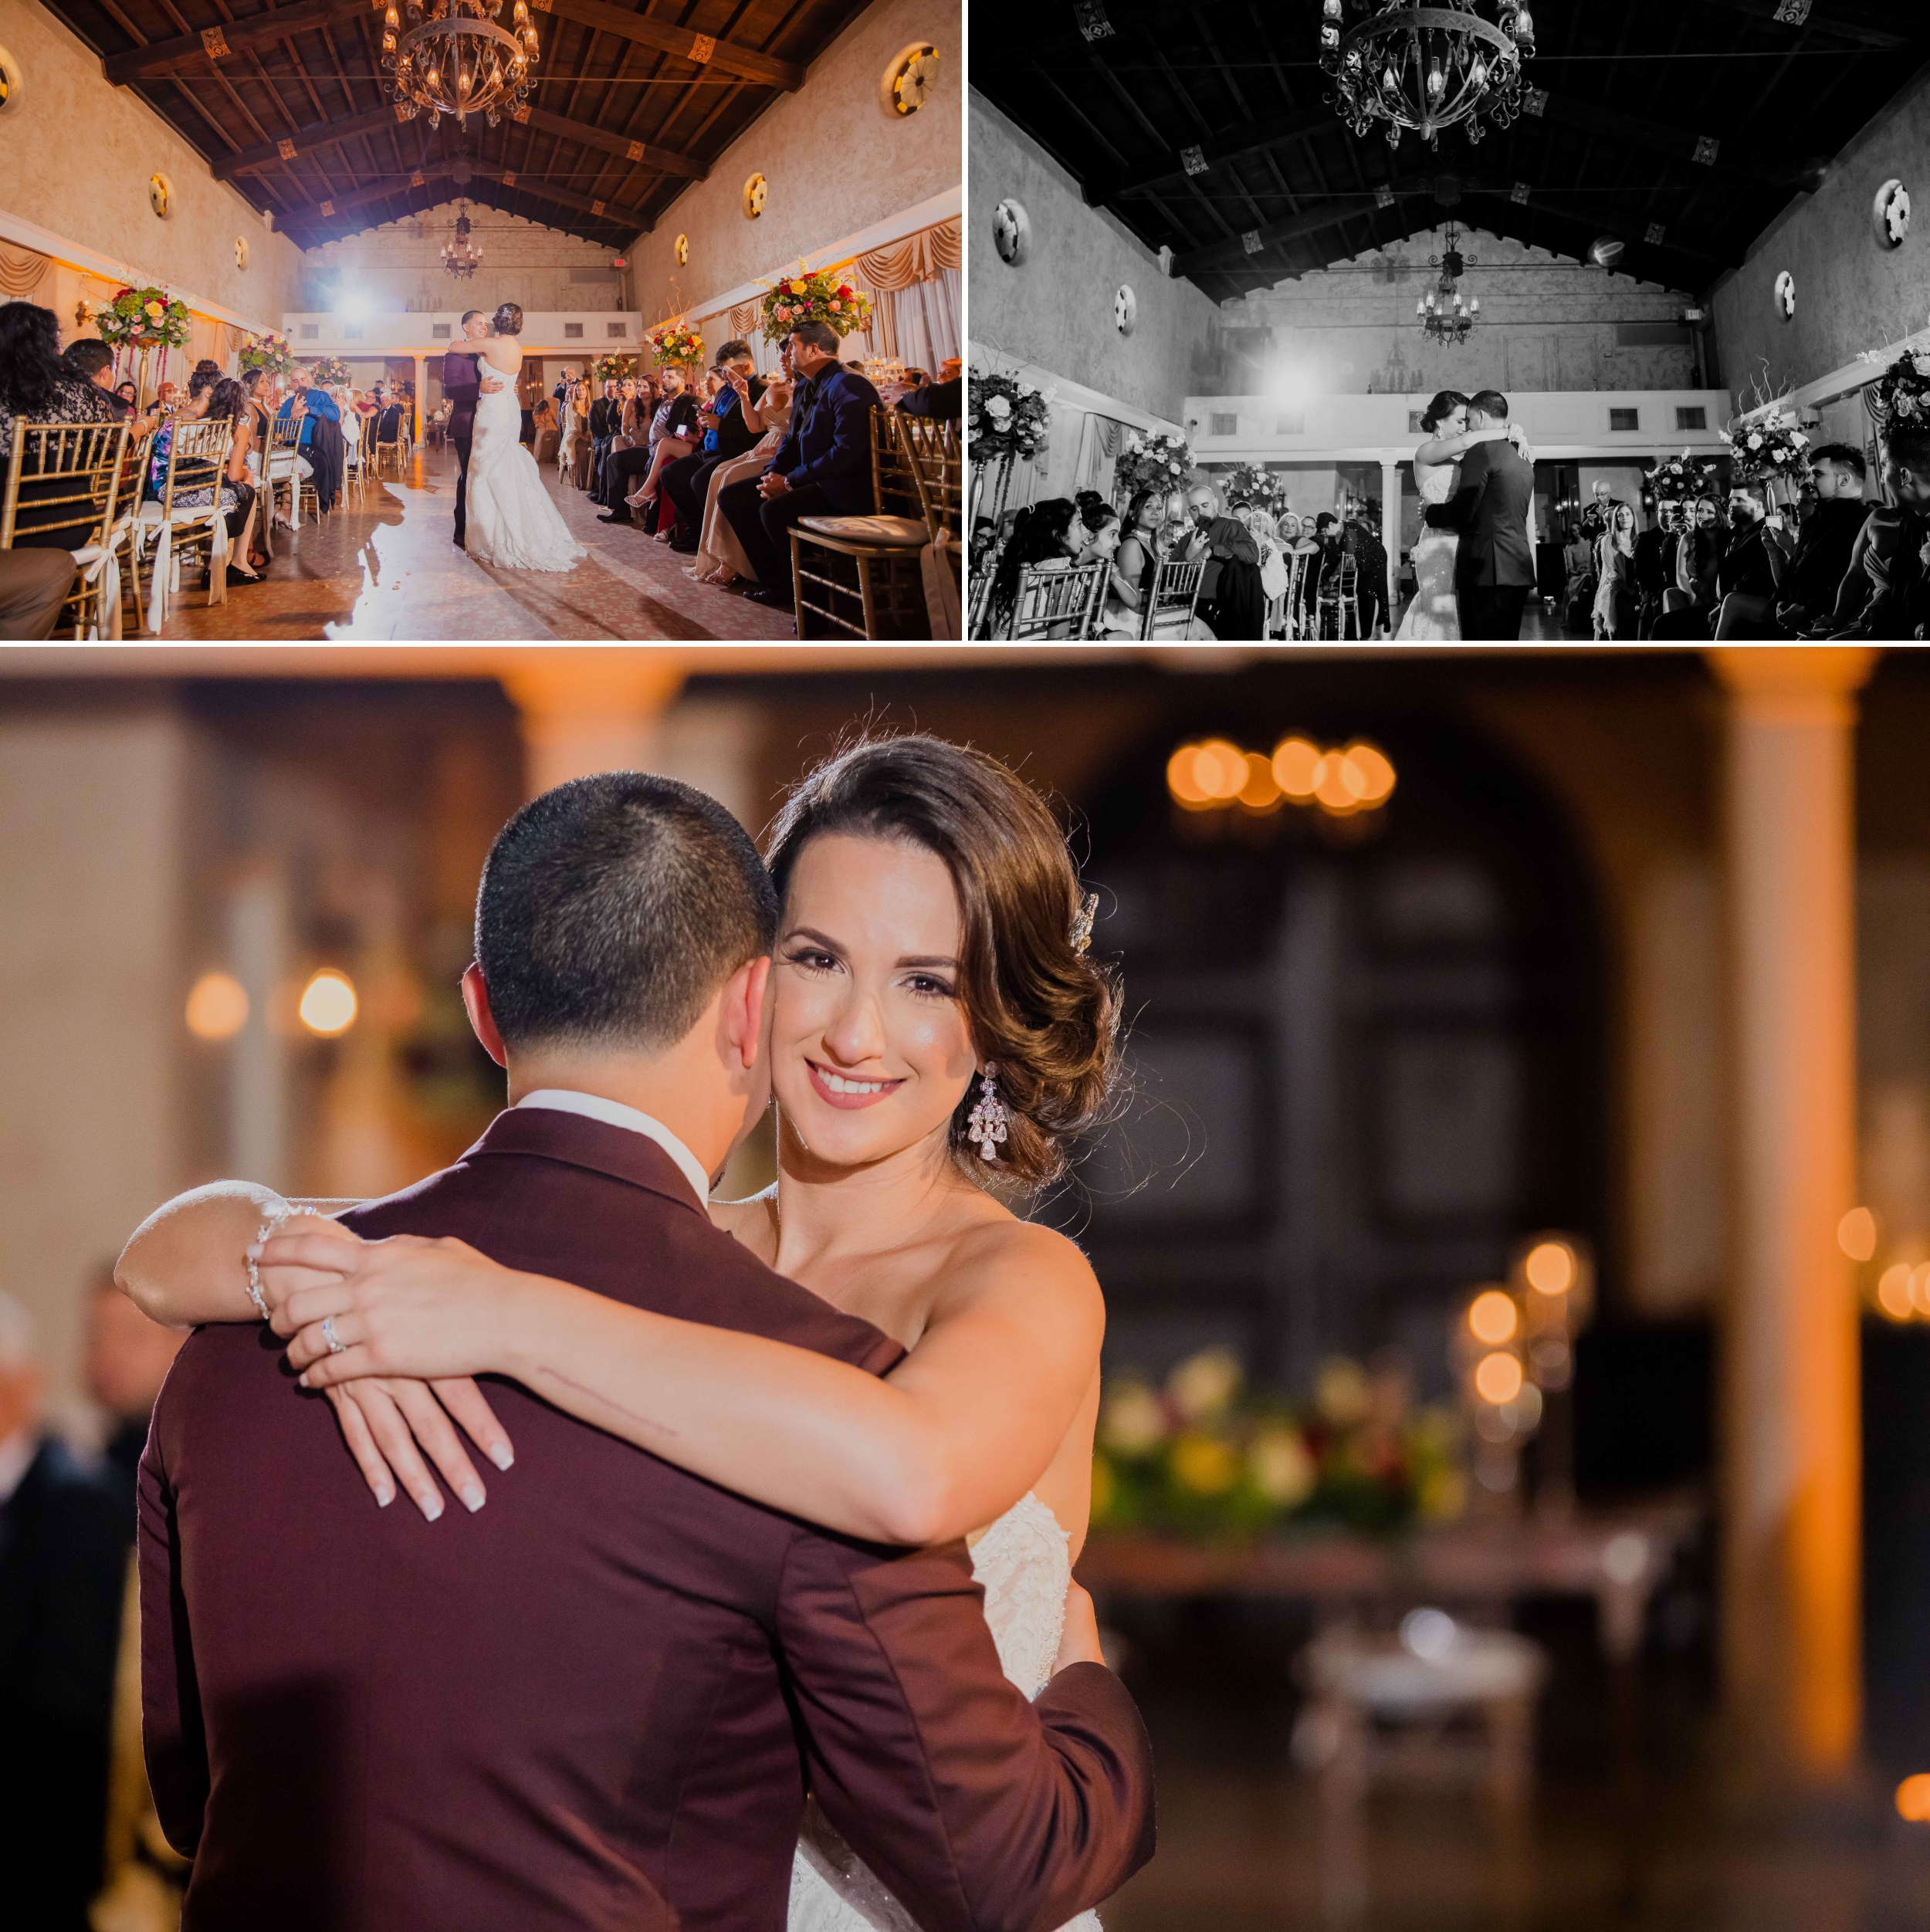 Wedding - Coco Plum - Coral Gables Congregational - Santy Martinez Photography 34.jpg